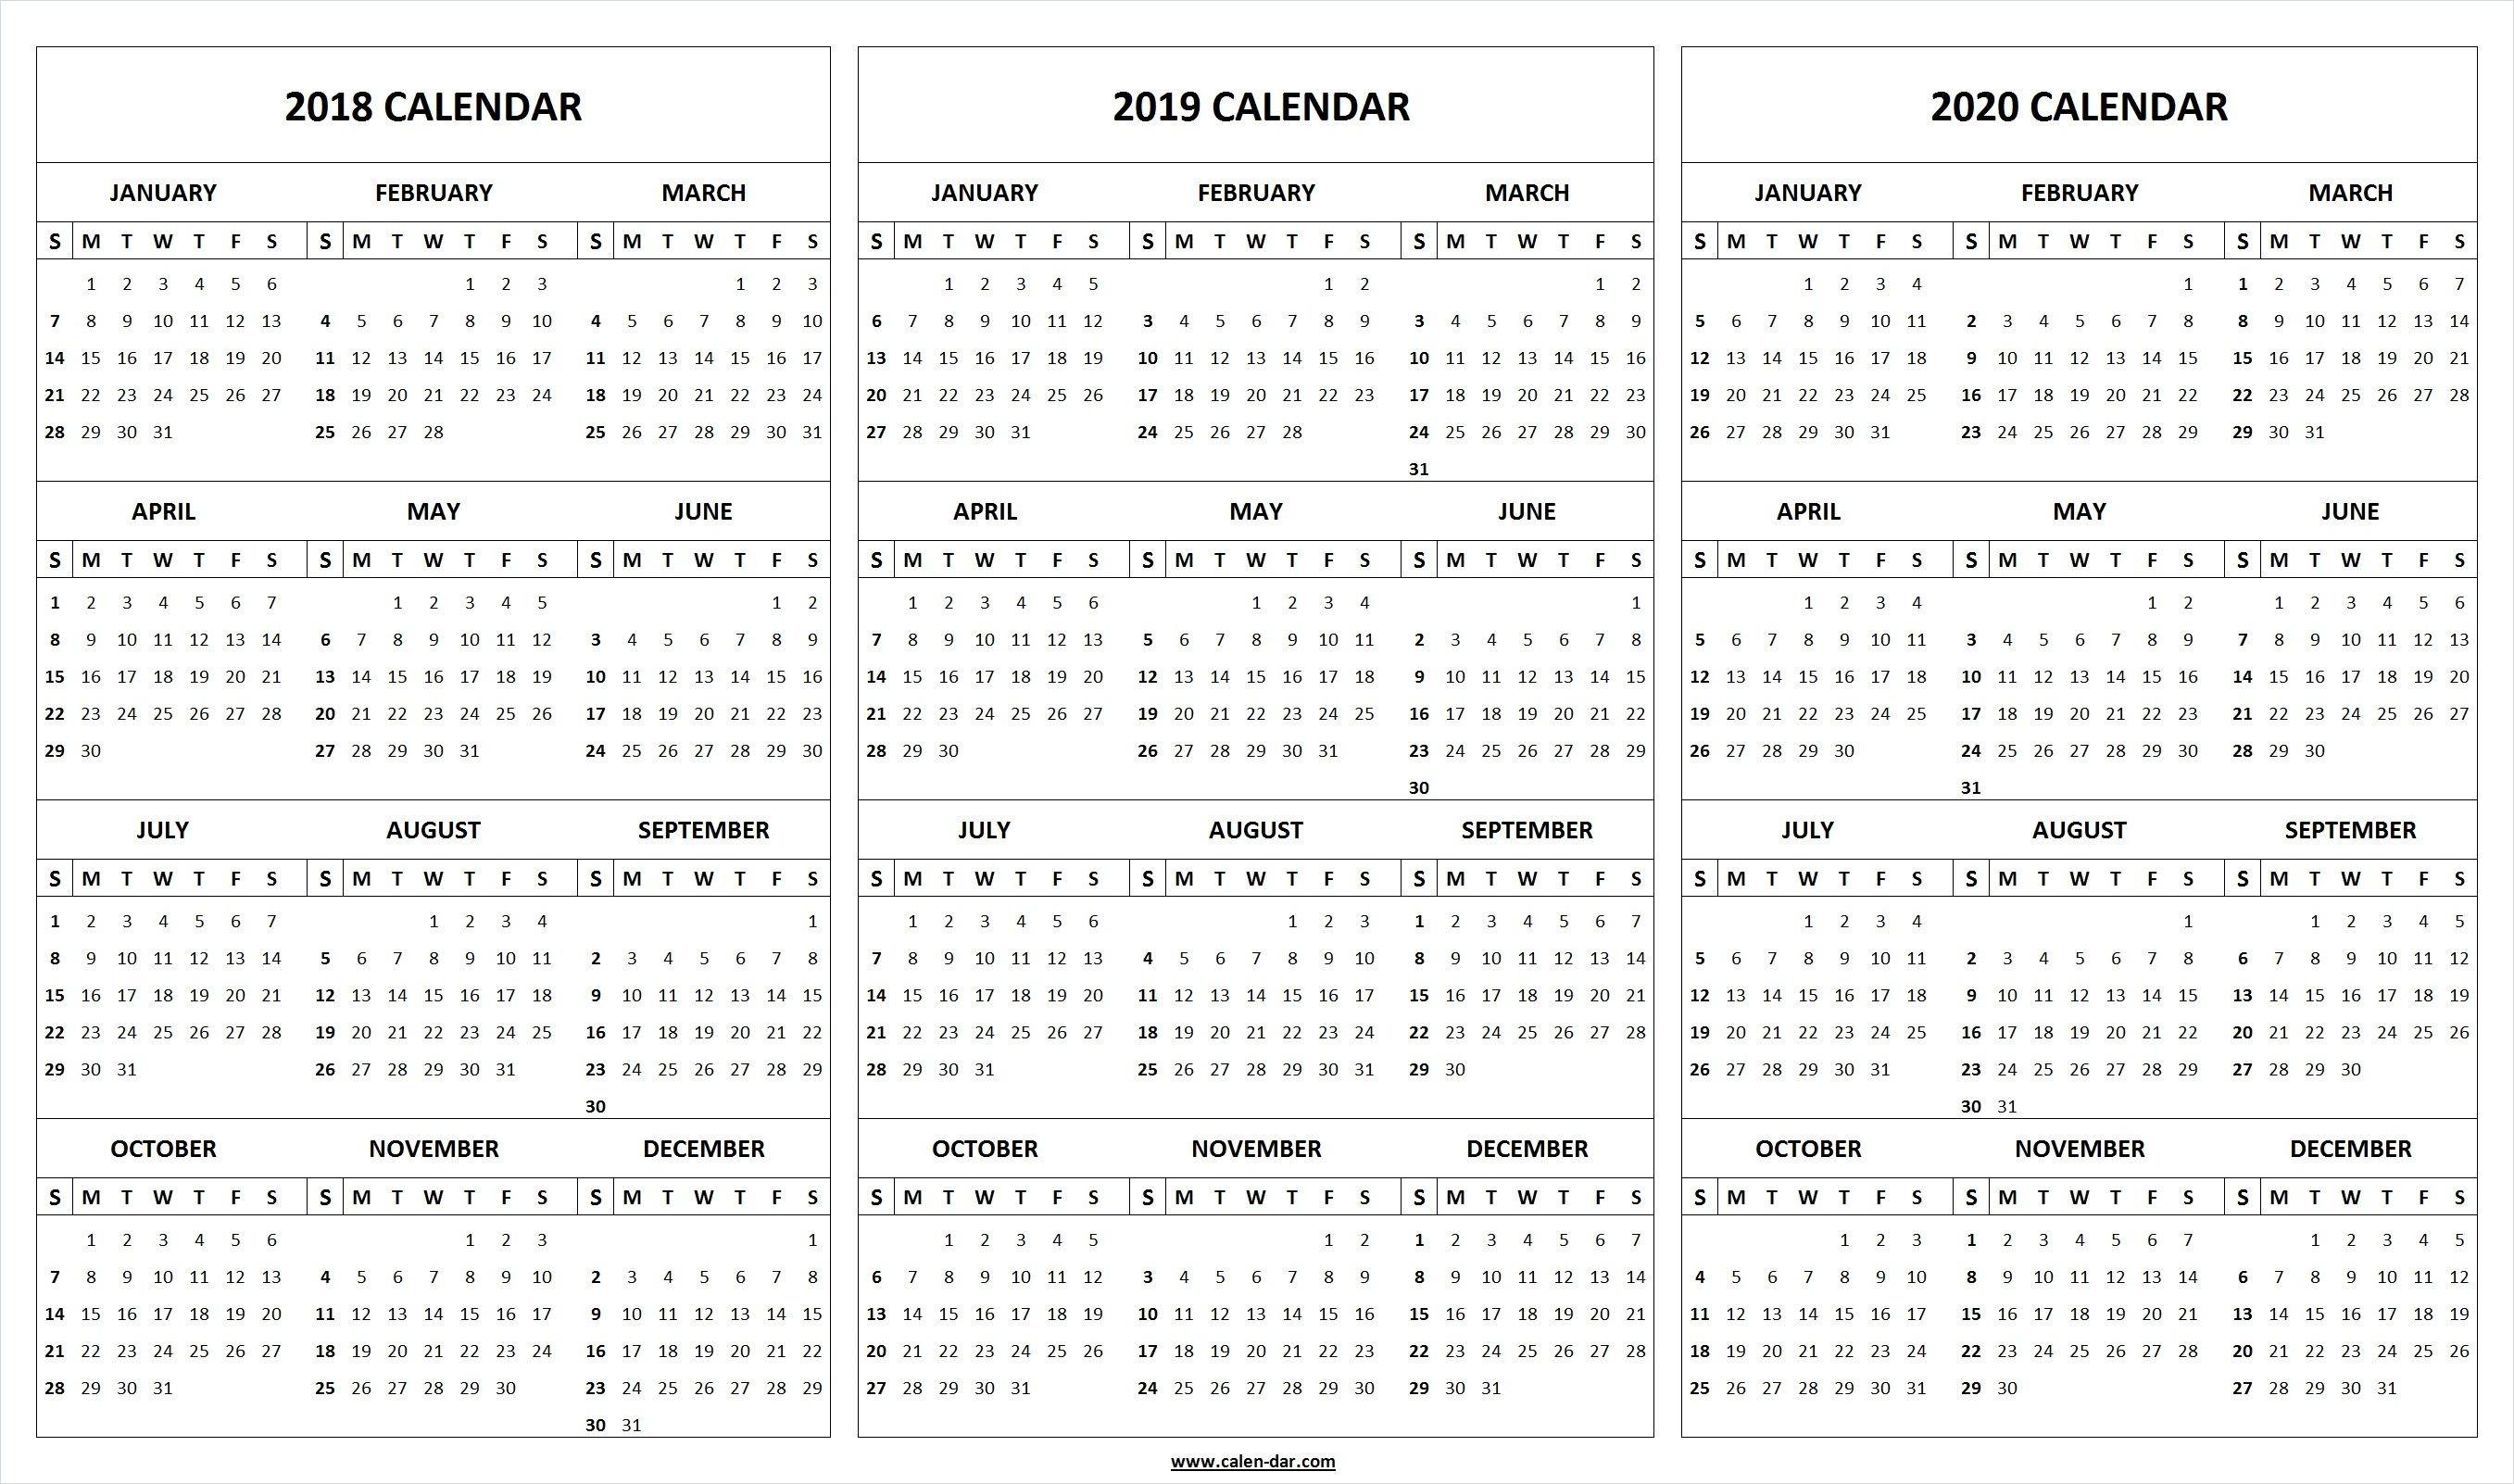 Print Blank 2018 2019 2020 Calendar Template | 2019 Calendar-Blank I-9 Form Printable 2020